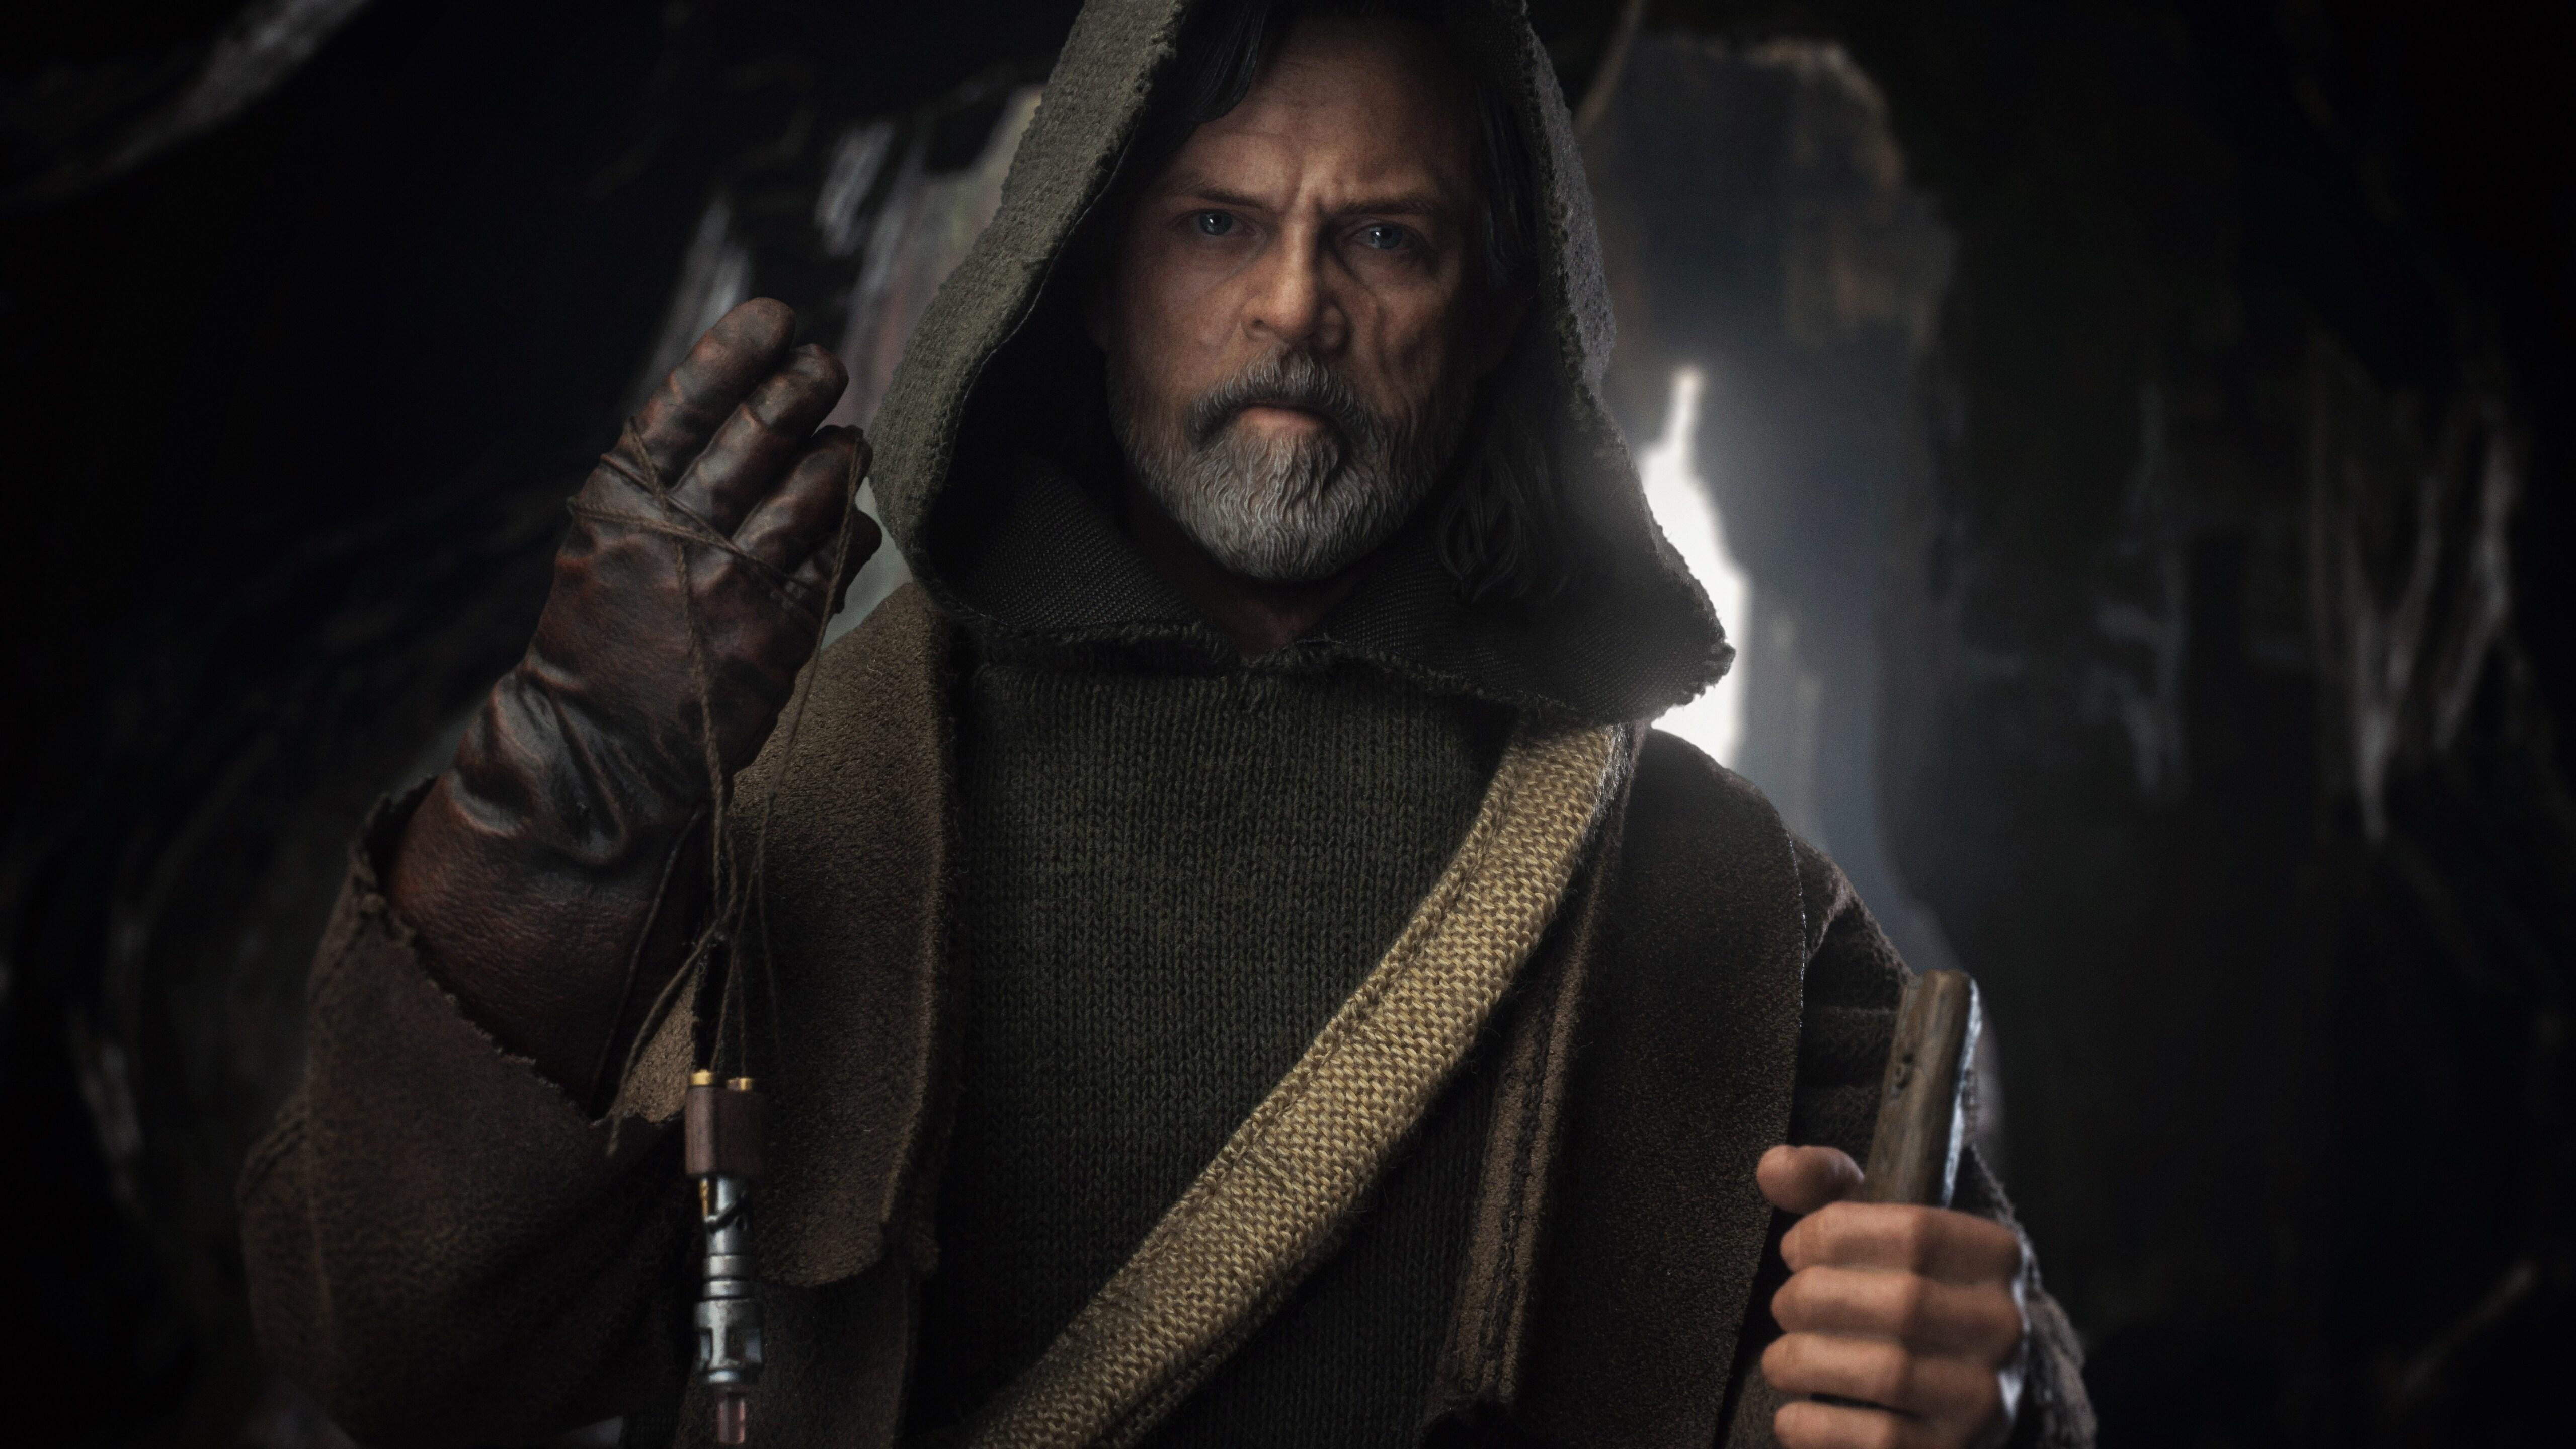 5120x2880 Master Luke Skywalker 5k Hd 4k Wallpapers Images